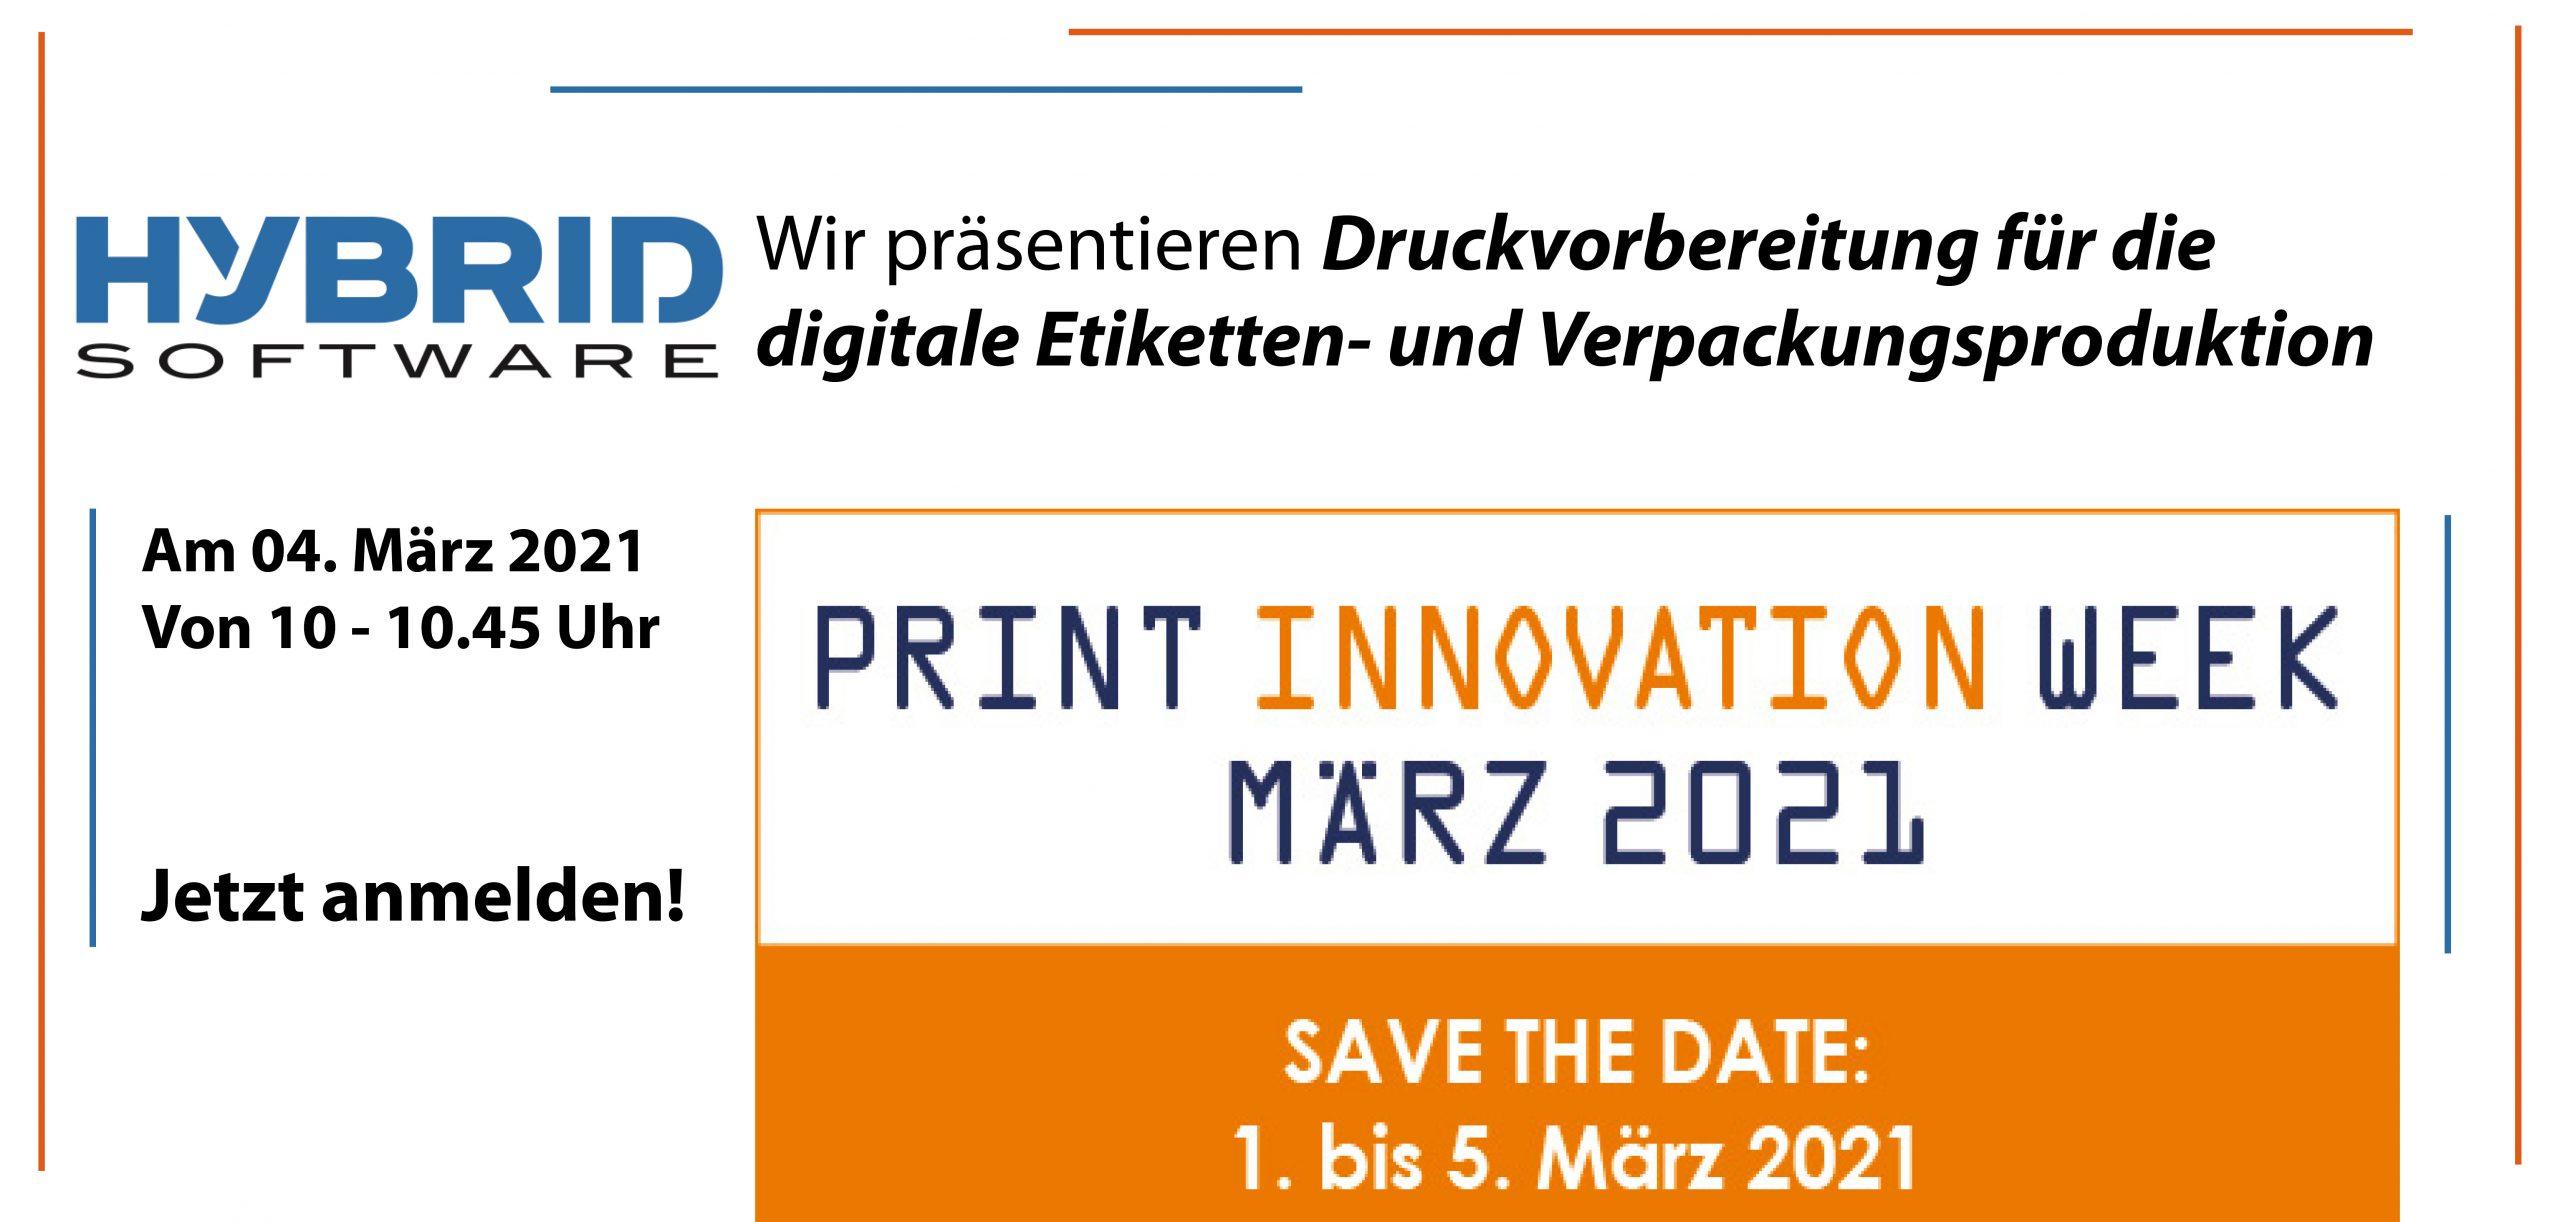 HYBRID Software Print Innovation Week